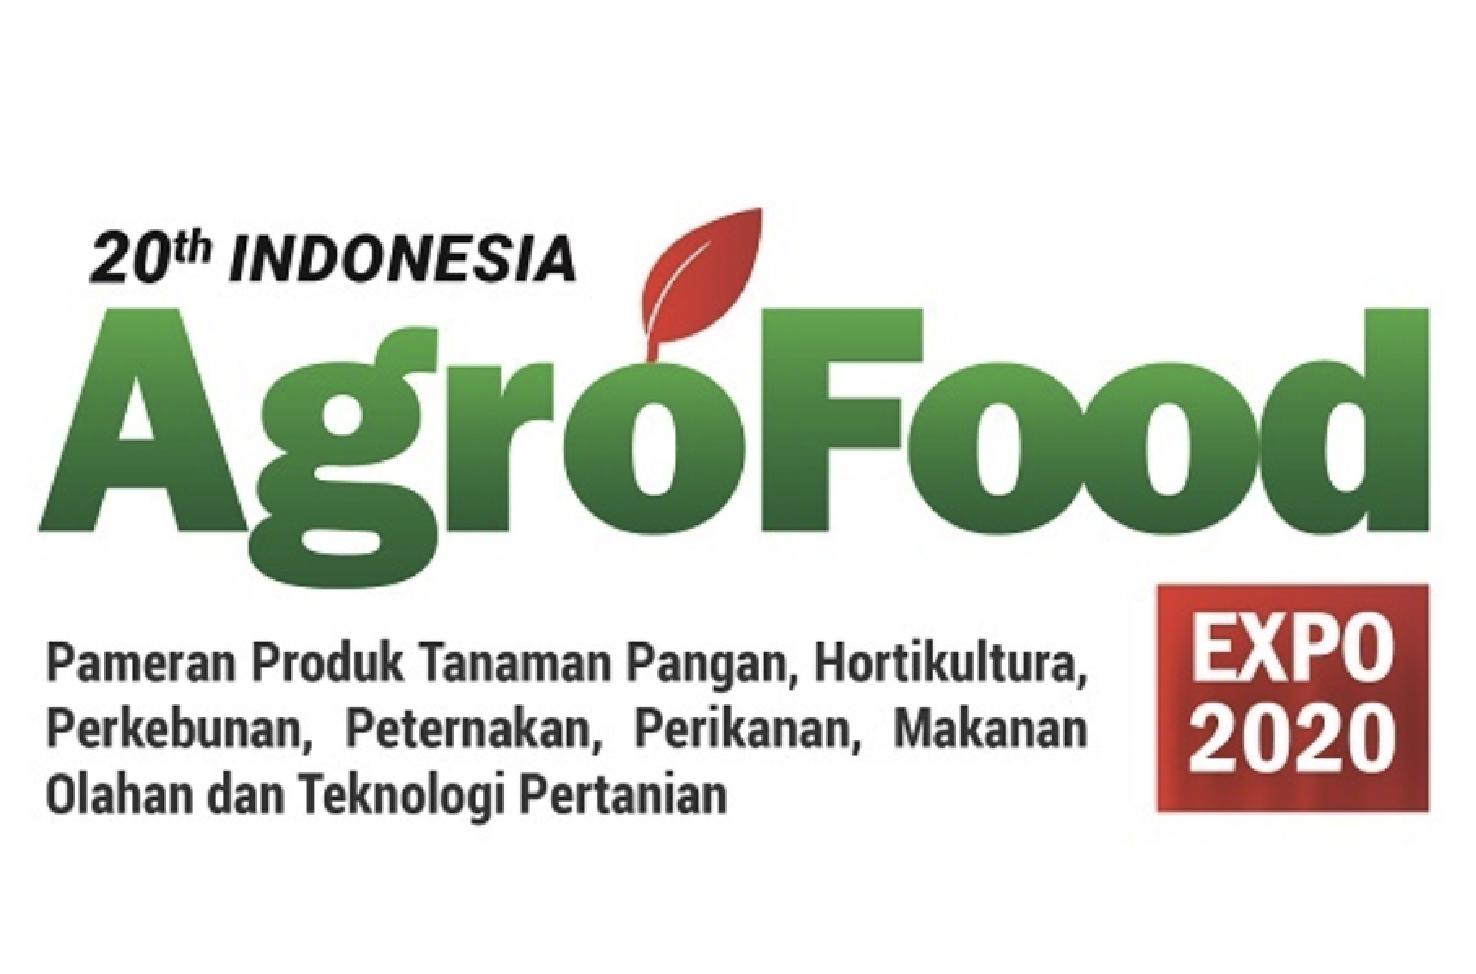 AgroFood Expo 2020 JCC 9–12 April 2020